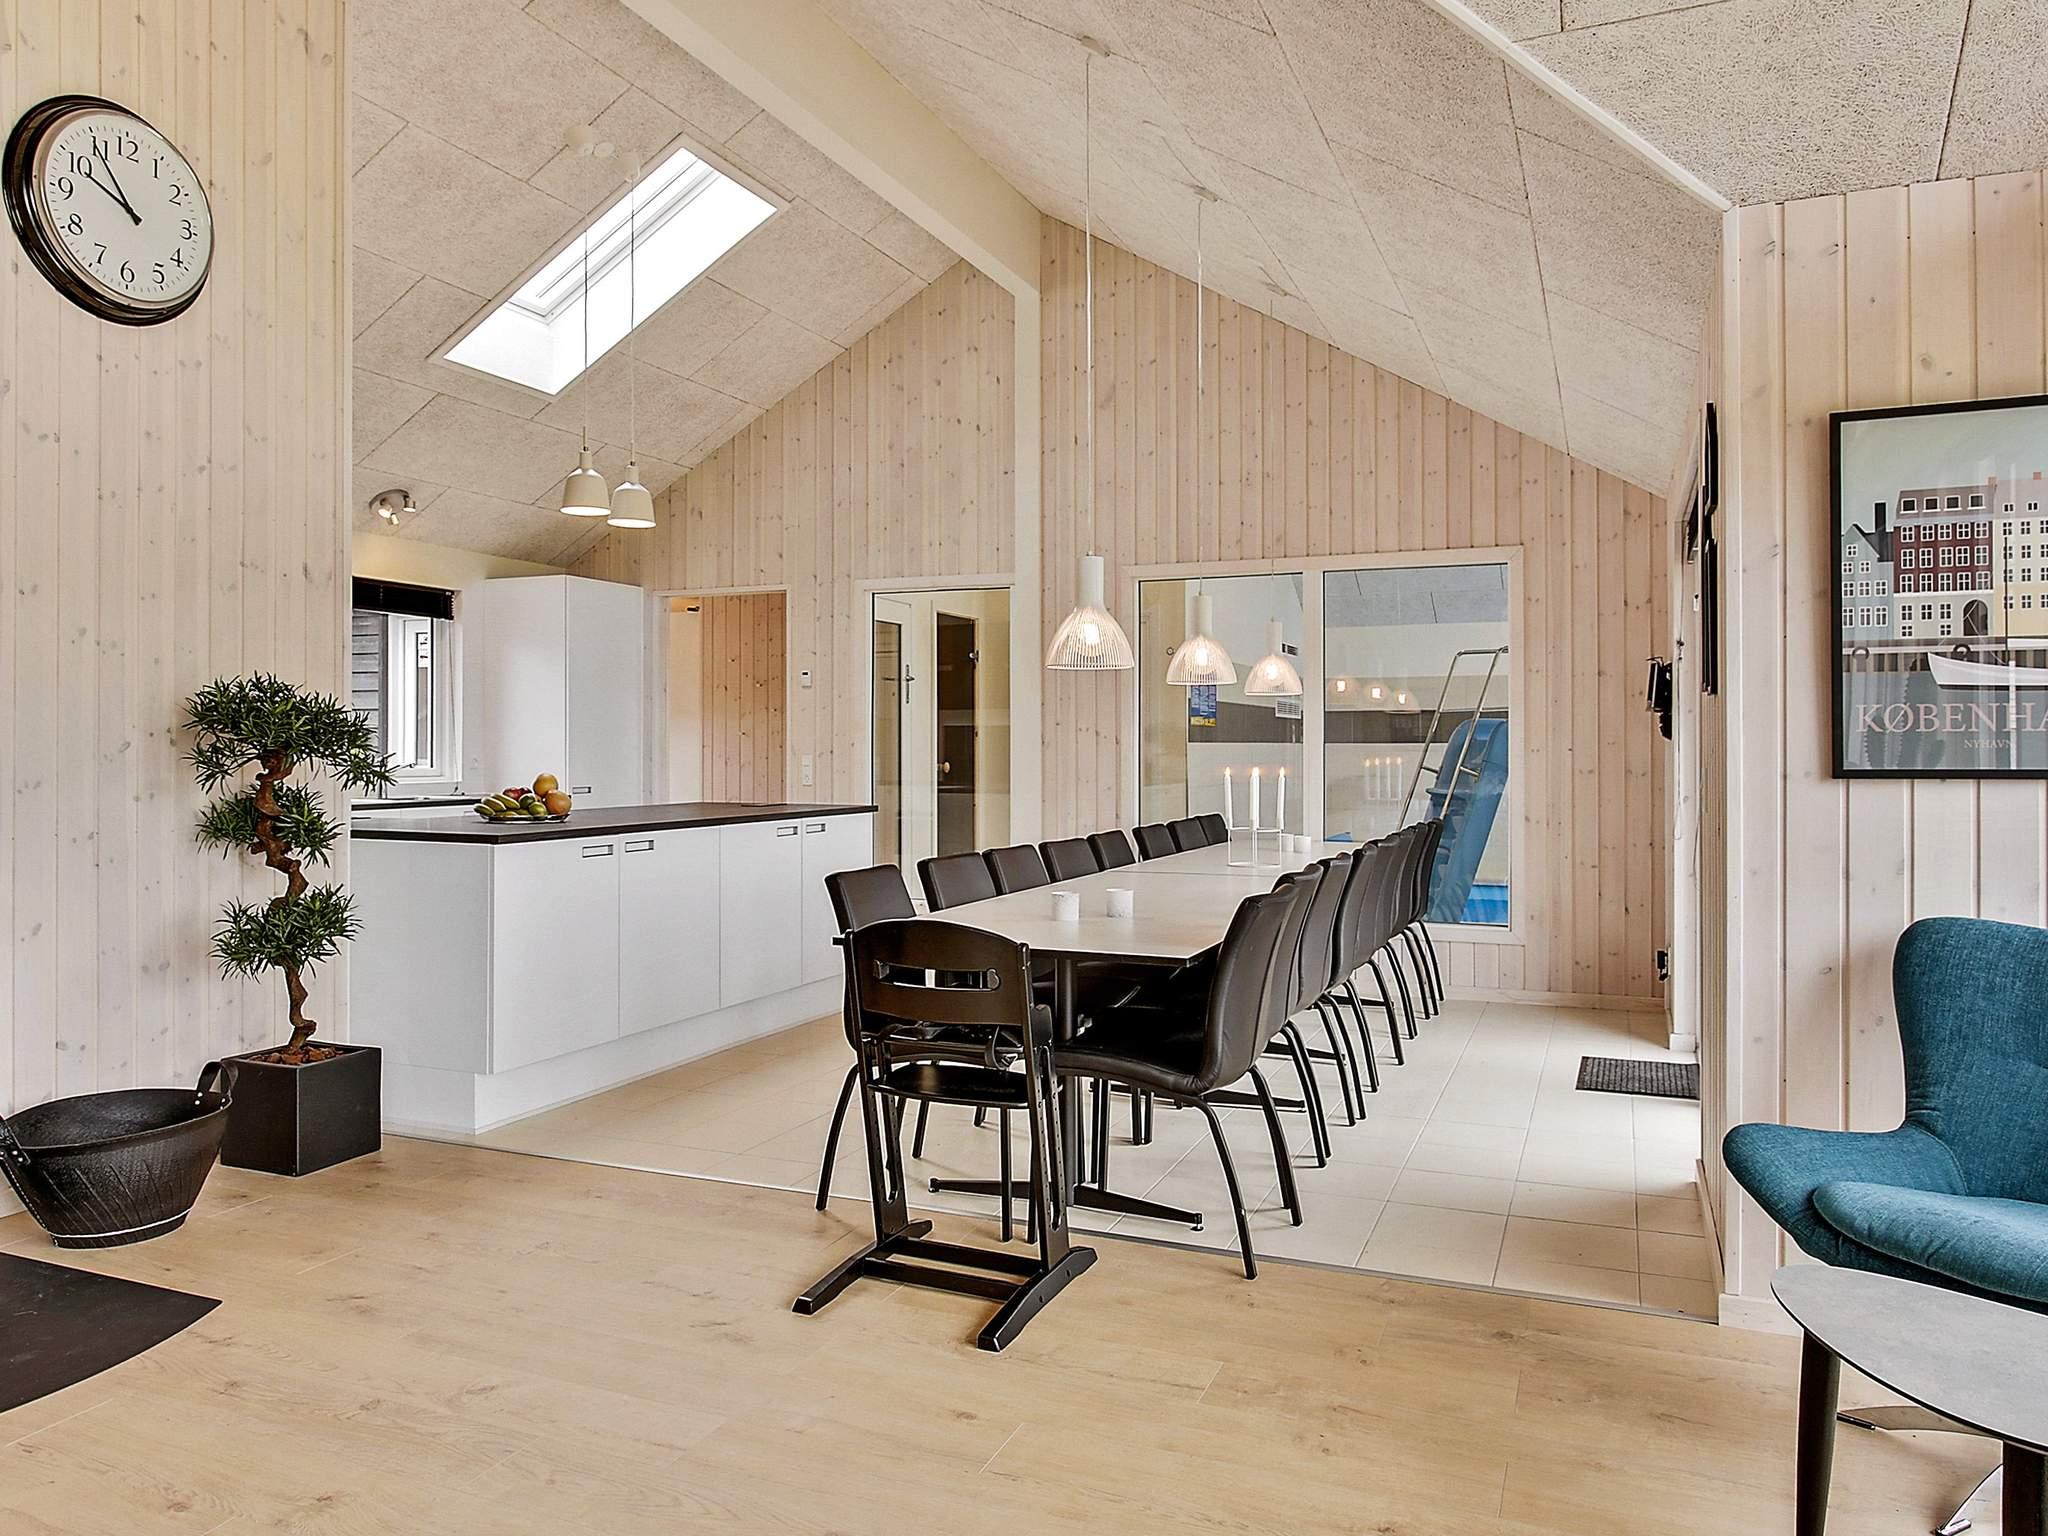 Ferienhaus Vejby Strand (2032832), Vejby, , Nordseeland, Dänemark, Bild 3